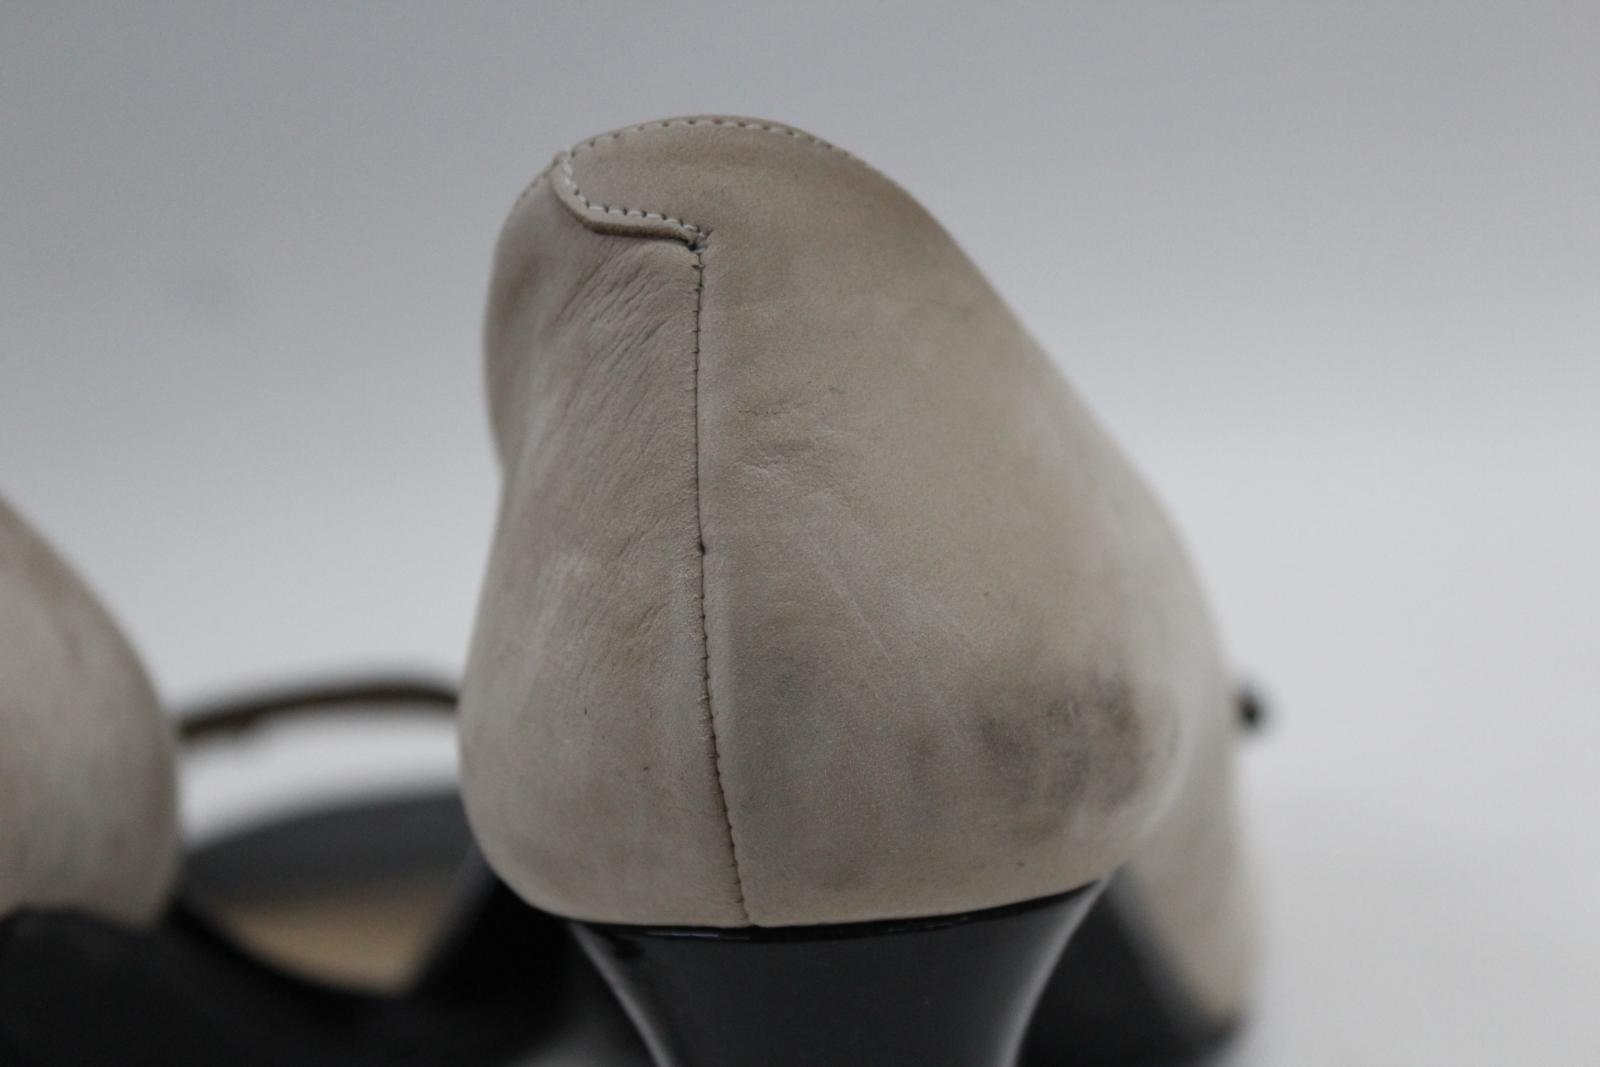 AUDLEY-London-Beige-Leather-Open-Peep-Toe-Bloc-Heel-Court-Shoes-EU39-UK6 thumbnail 7